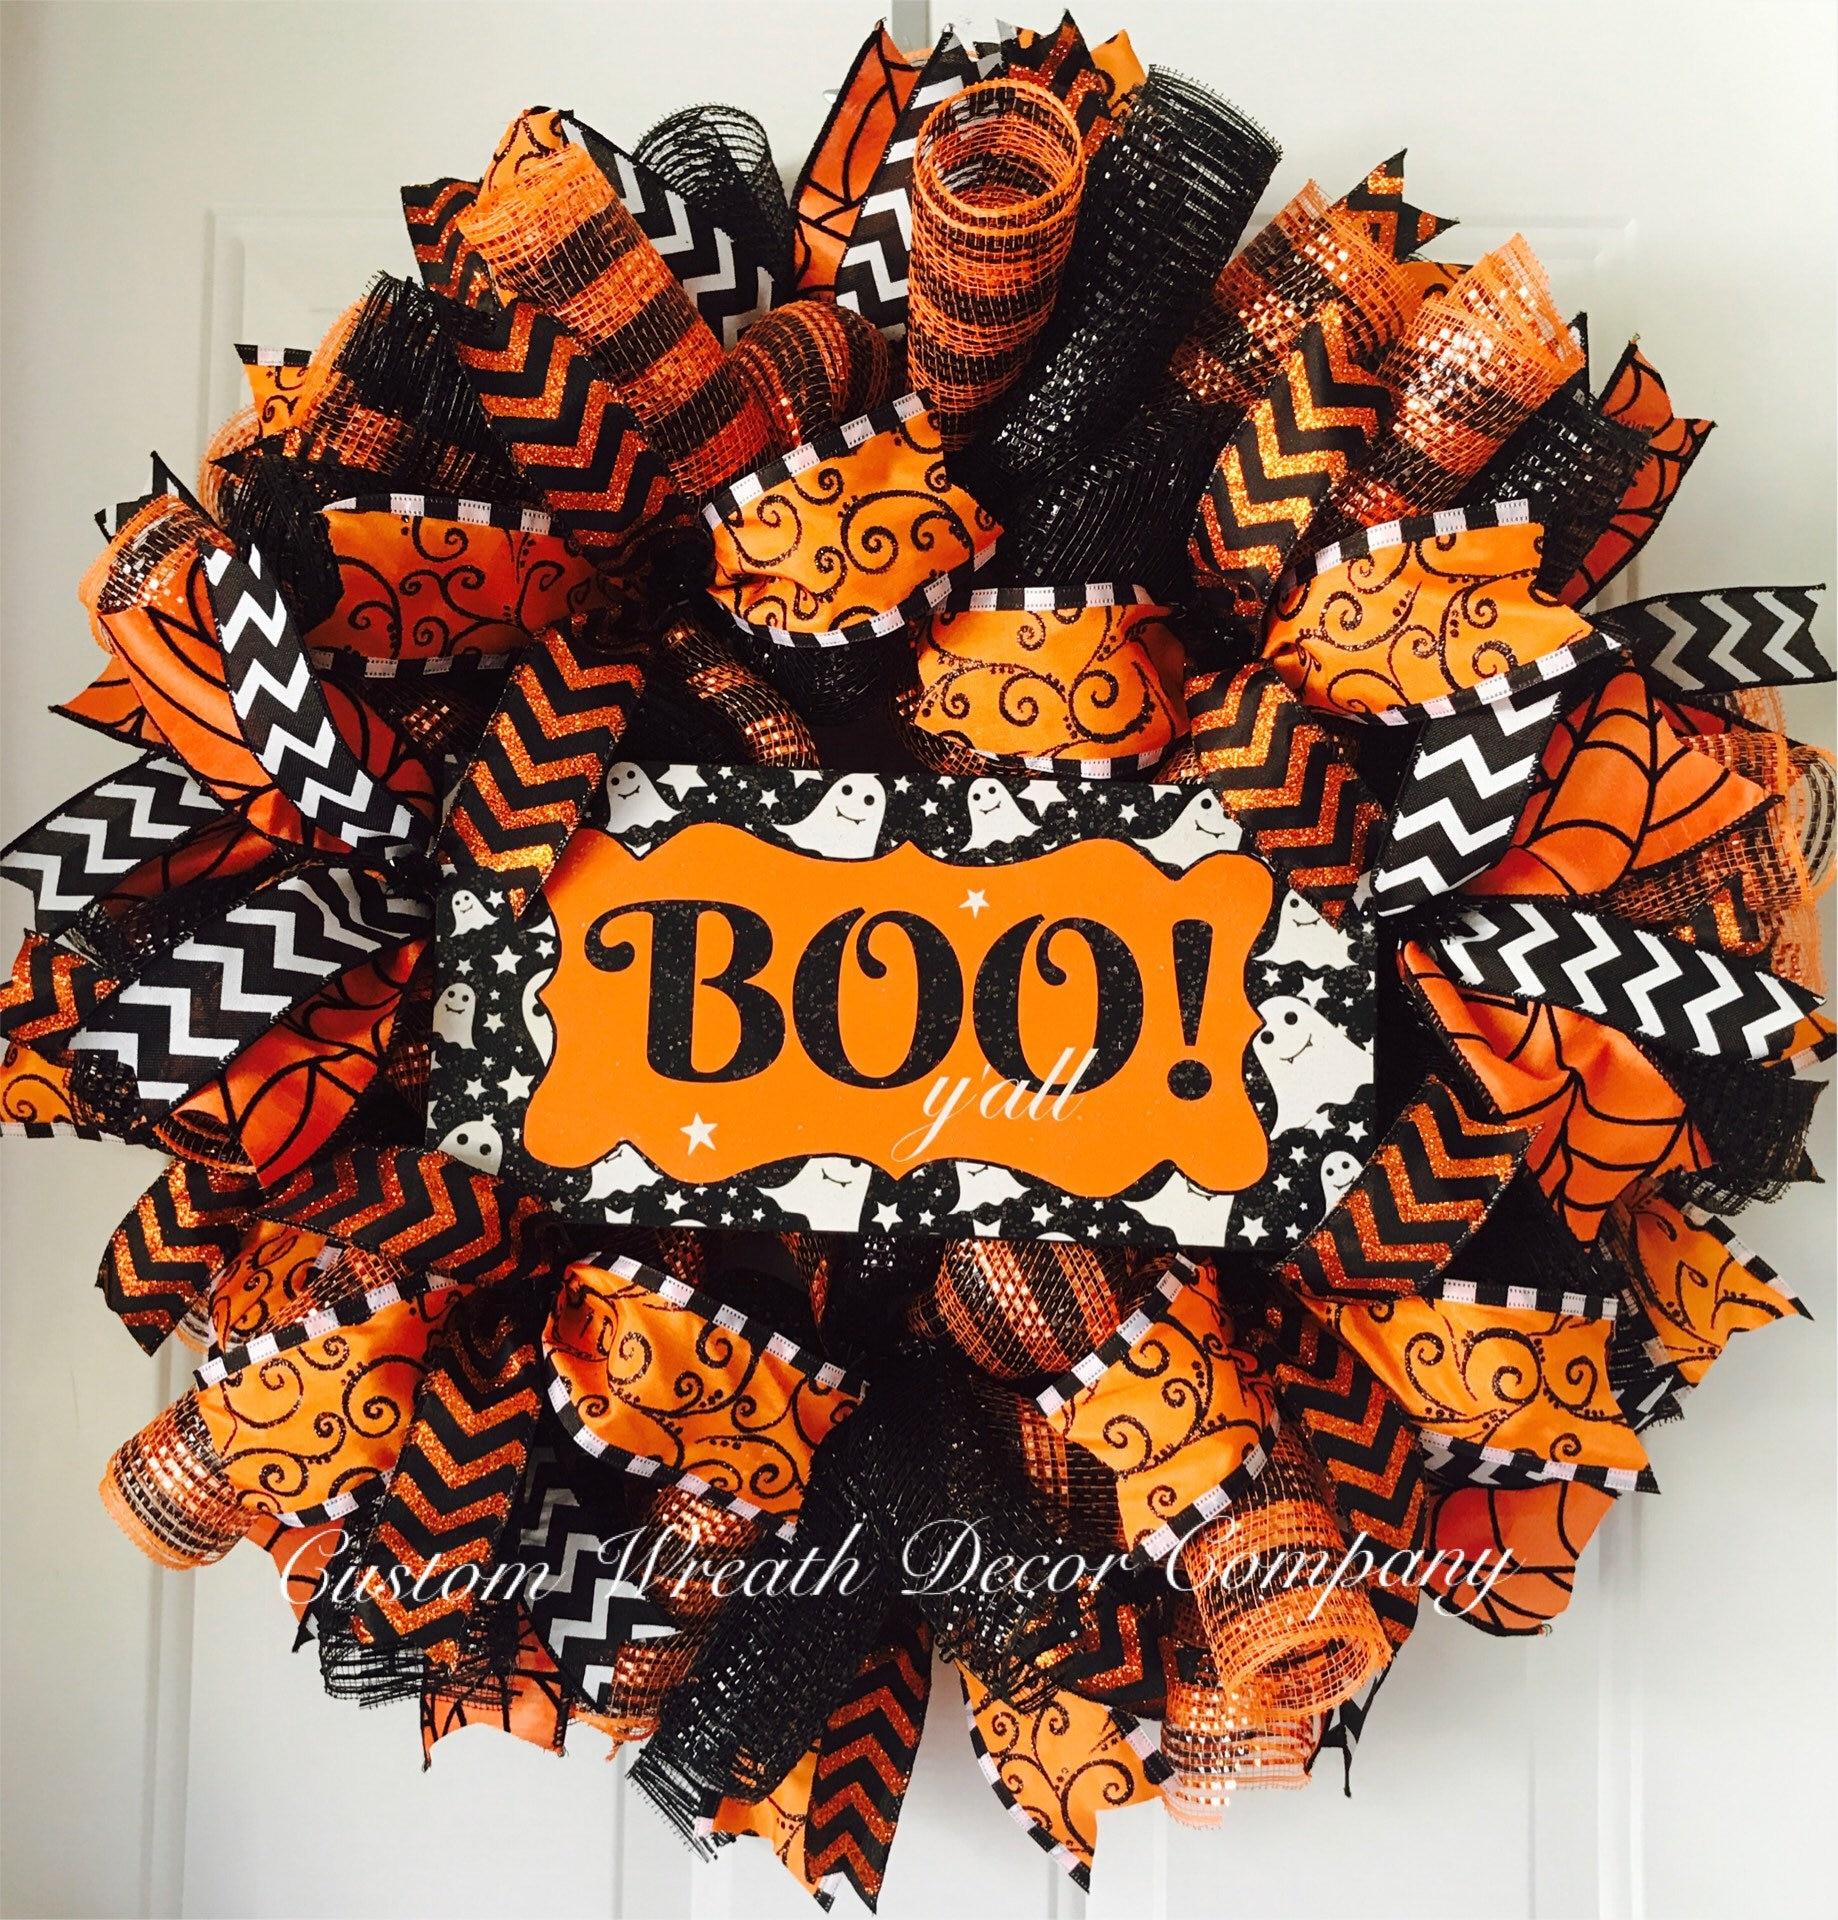 Halloween Boo Wreath Orange Black Halloween Wreath Ghost Wreath Sparkly Glitter Halloween Wreath Spooky Wreath Scary Wreath